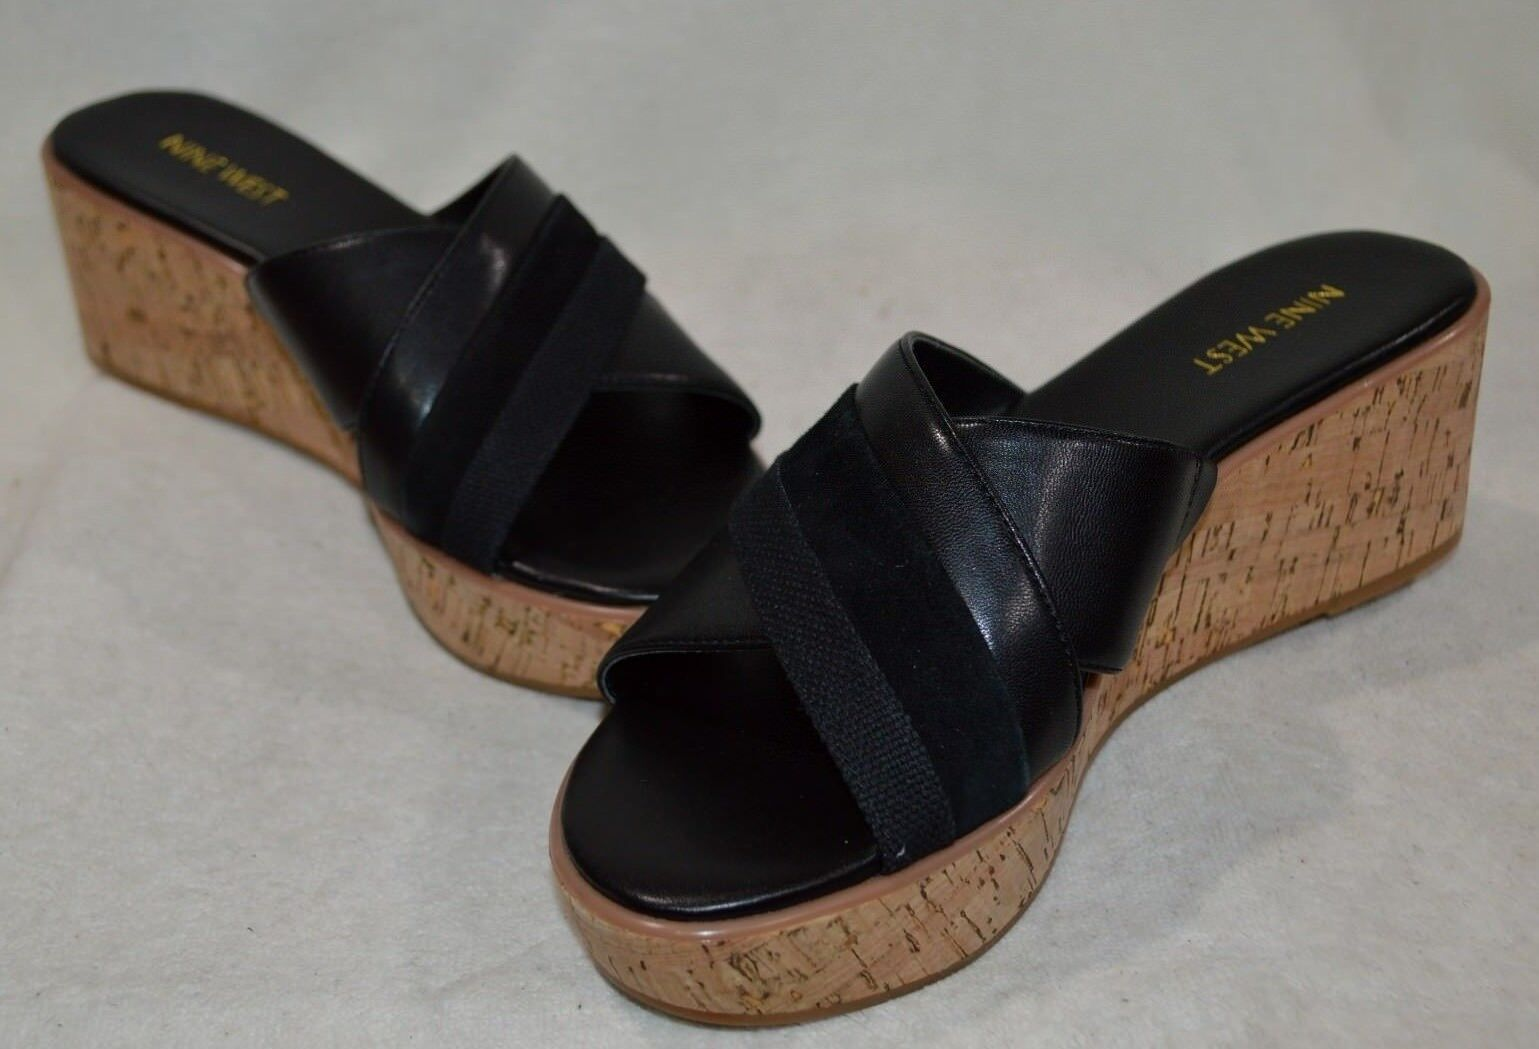 Bernardo Women's Poppy Thong Sandal Black / Luggage Brown Size 7.5 M US